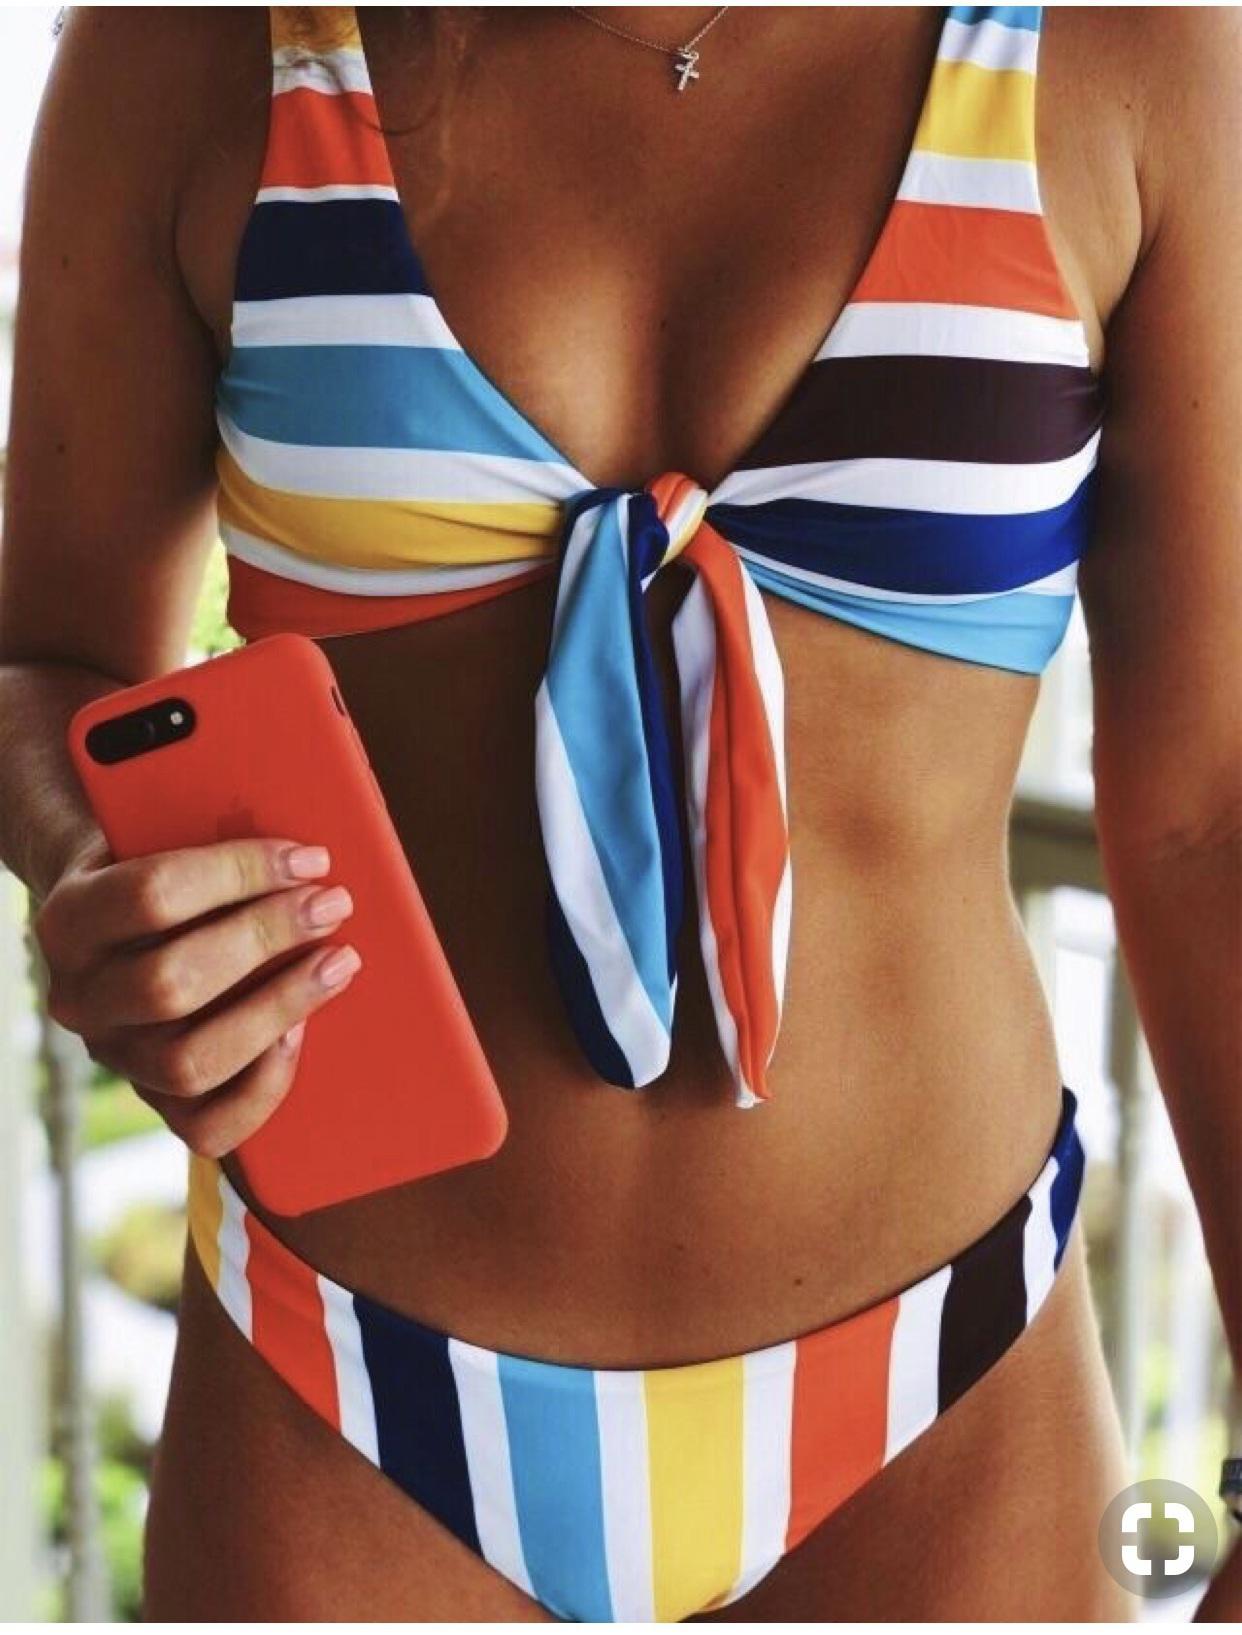 swimwear stripes red blue yellow bikini front tie bikini colorful brand tie dip swimwear bow low v-cut two-piece summer season ocean colorblocked